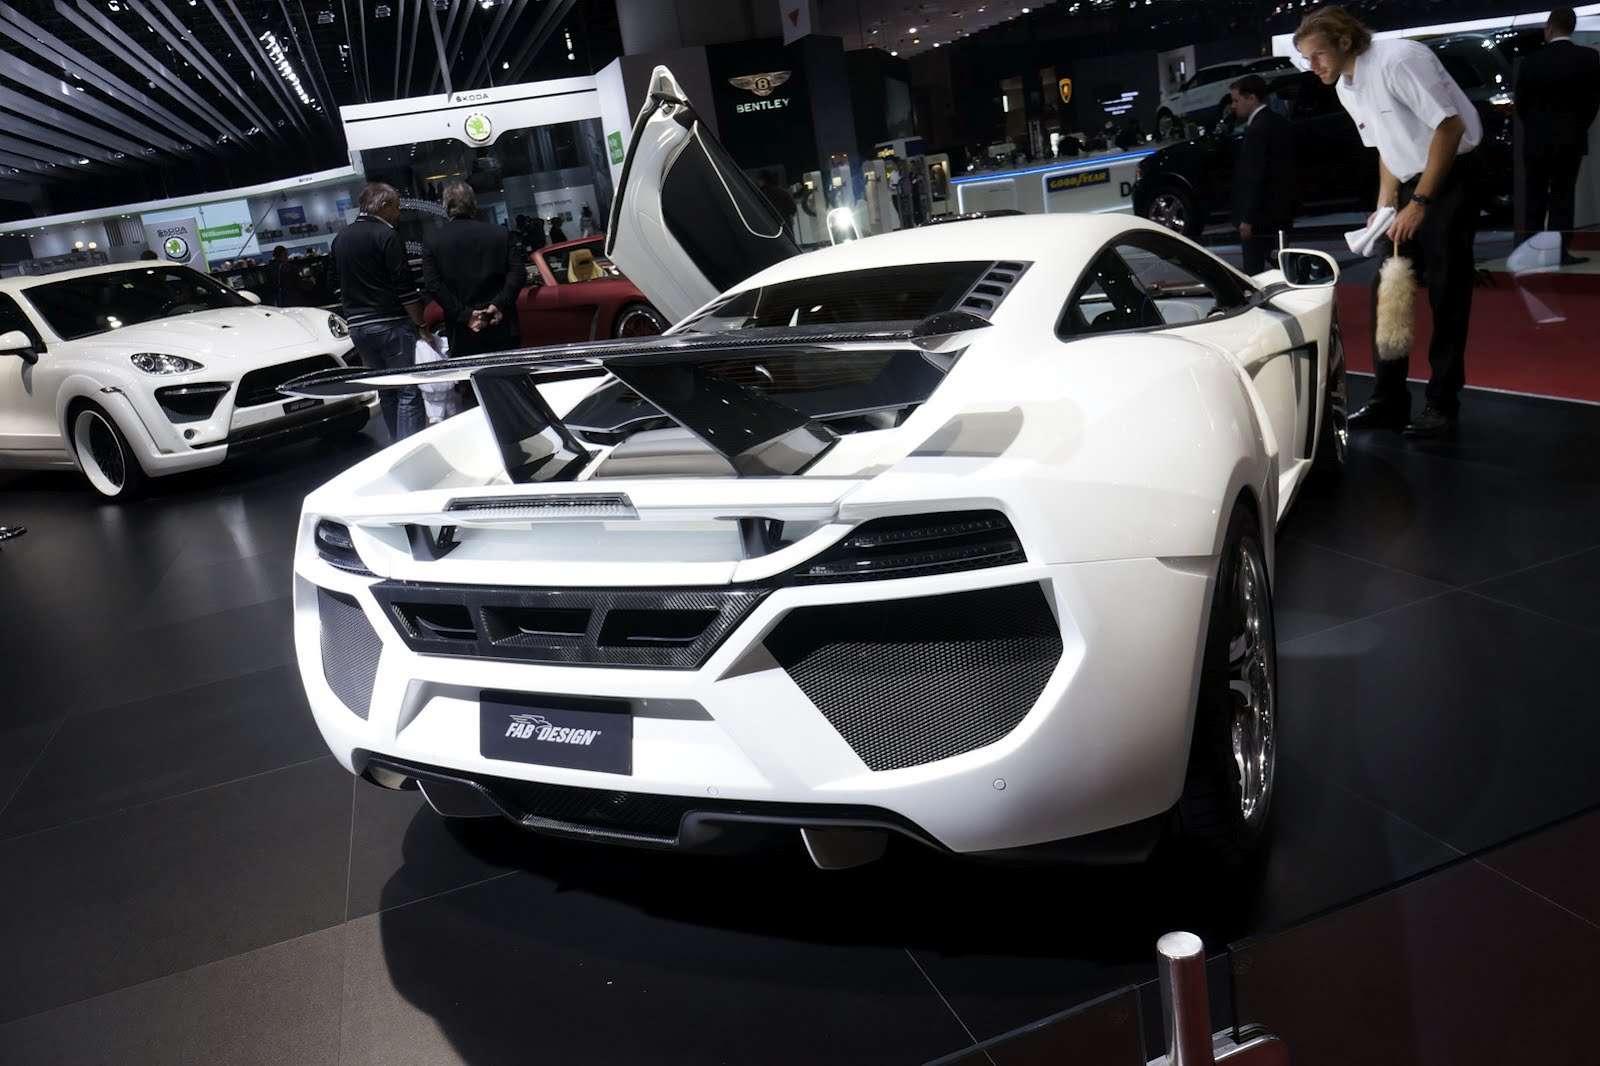 FAB Design McLaren MP4-12C Genewa 2012